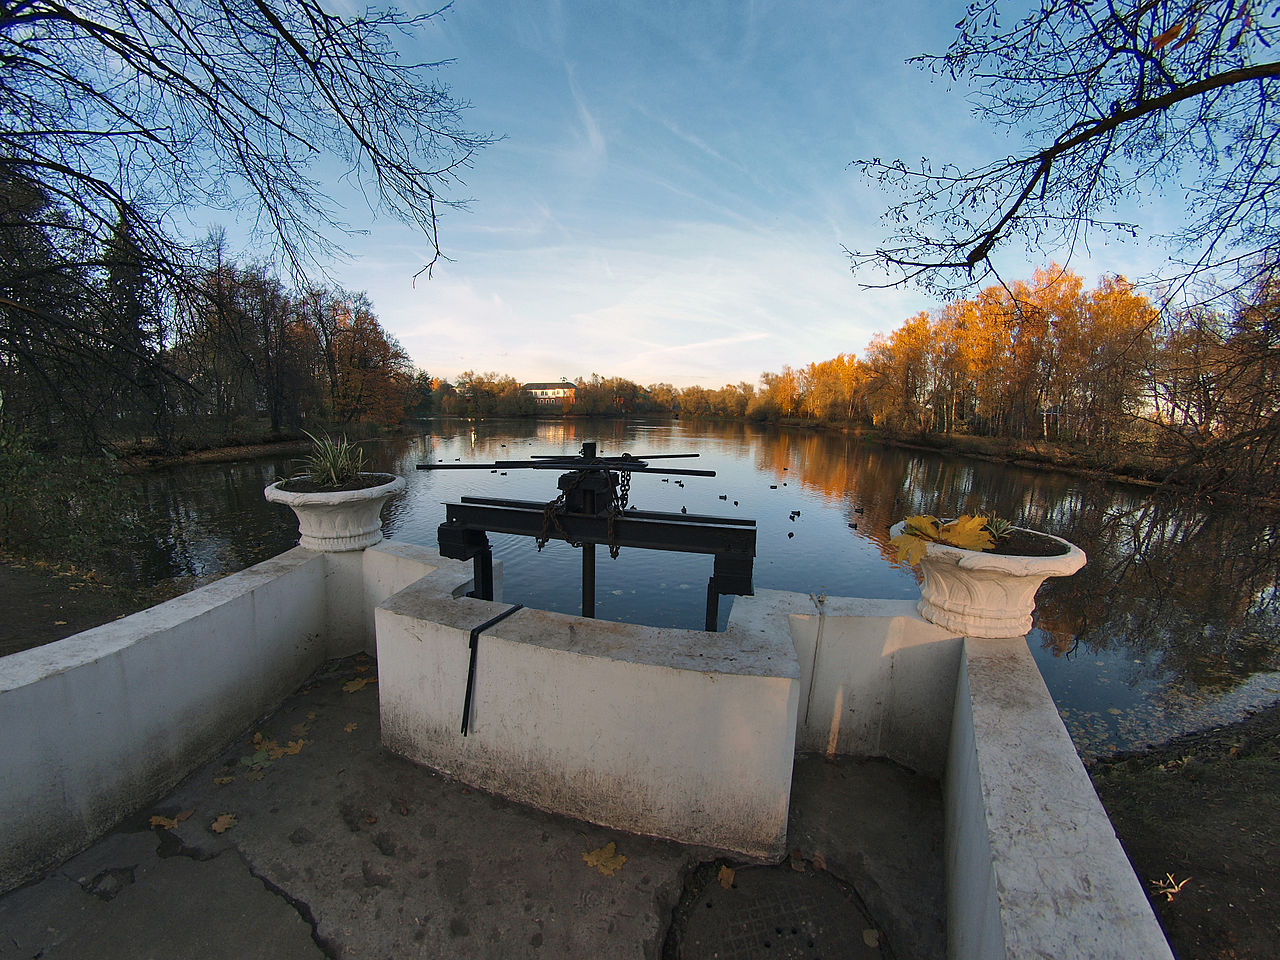 Остафьево, плотина с шлюзом на реку Любучу